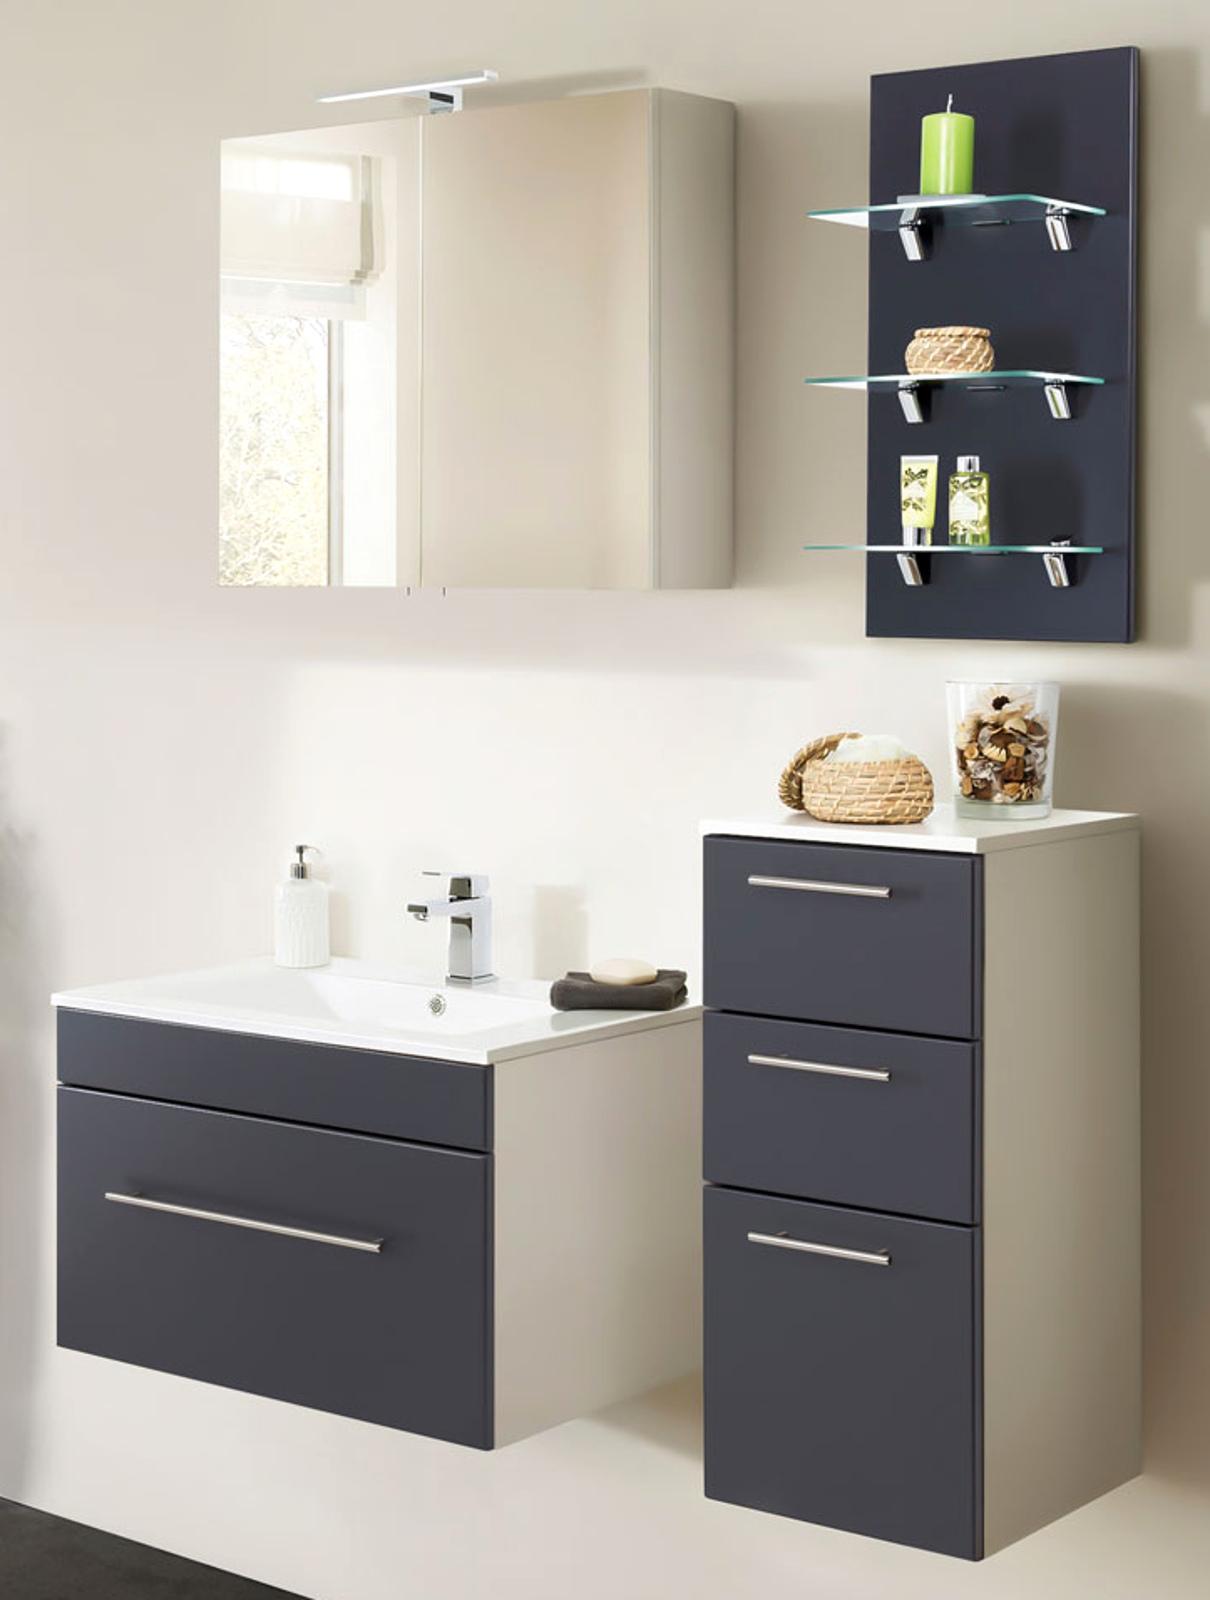 lowboard weiss hochglanz lack aus italien saliente12 592. Black Bedroom Furniture Sets. Home Design Ideas